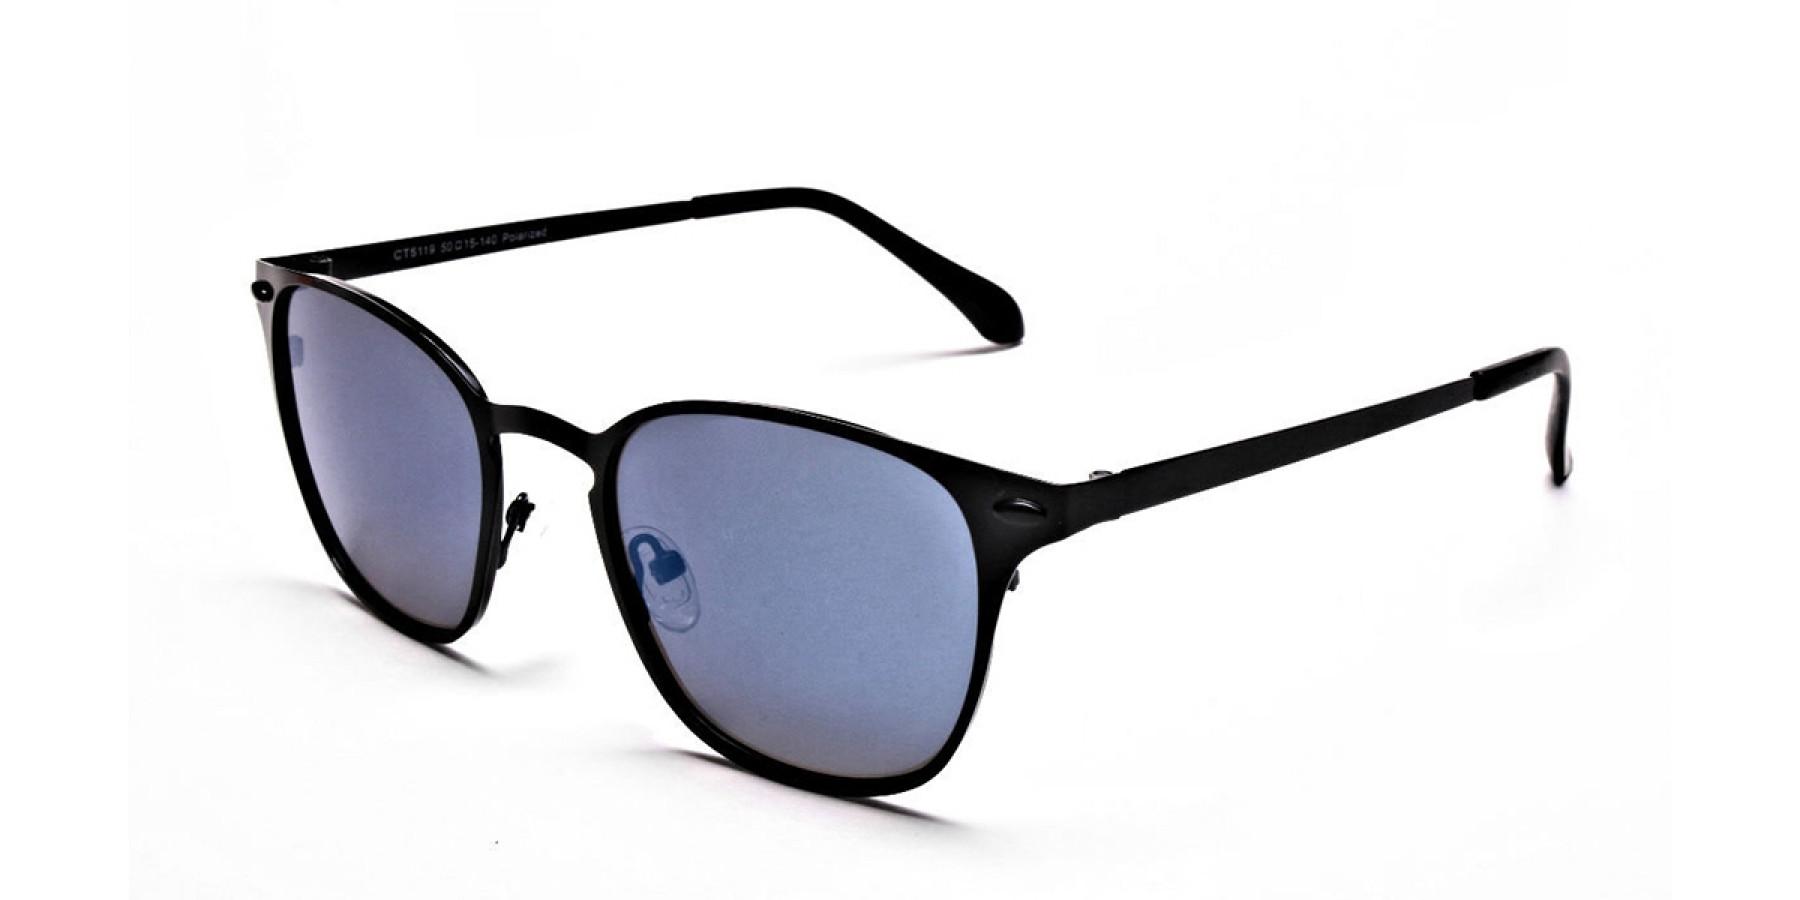 Blue Tinted Sunglasses -2